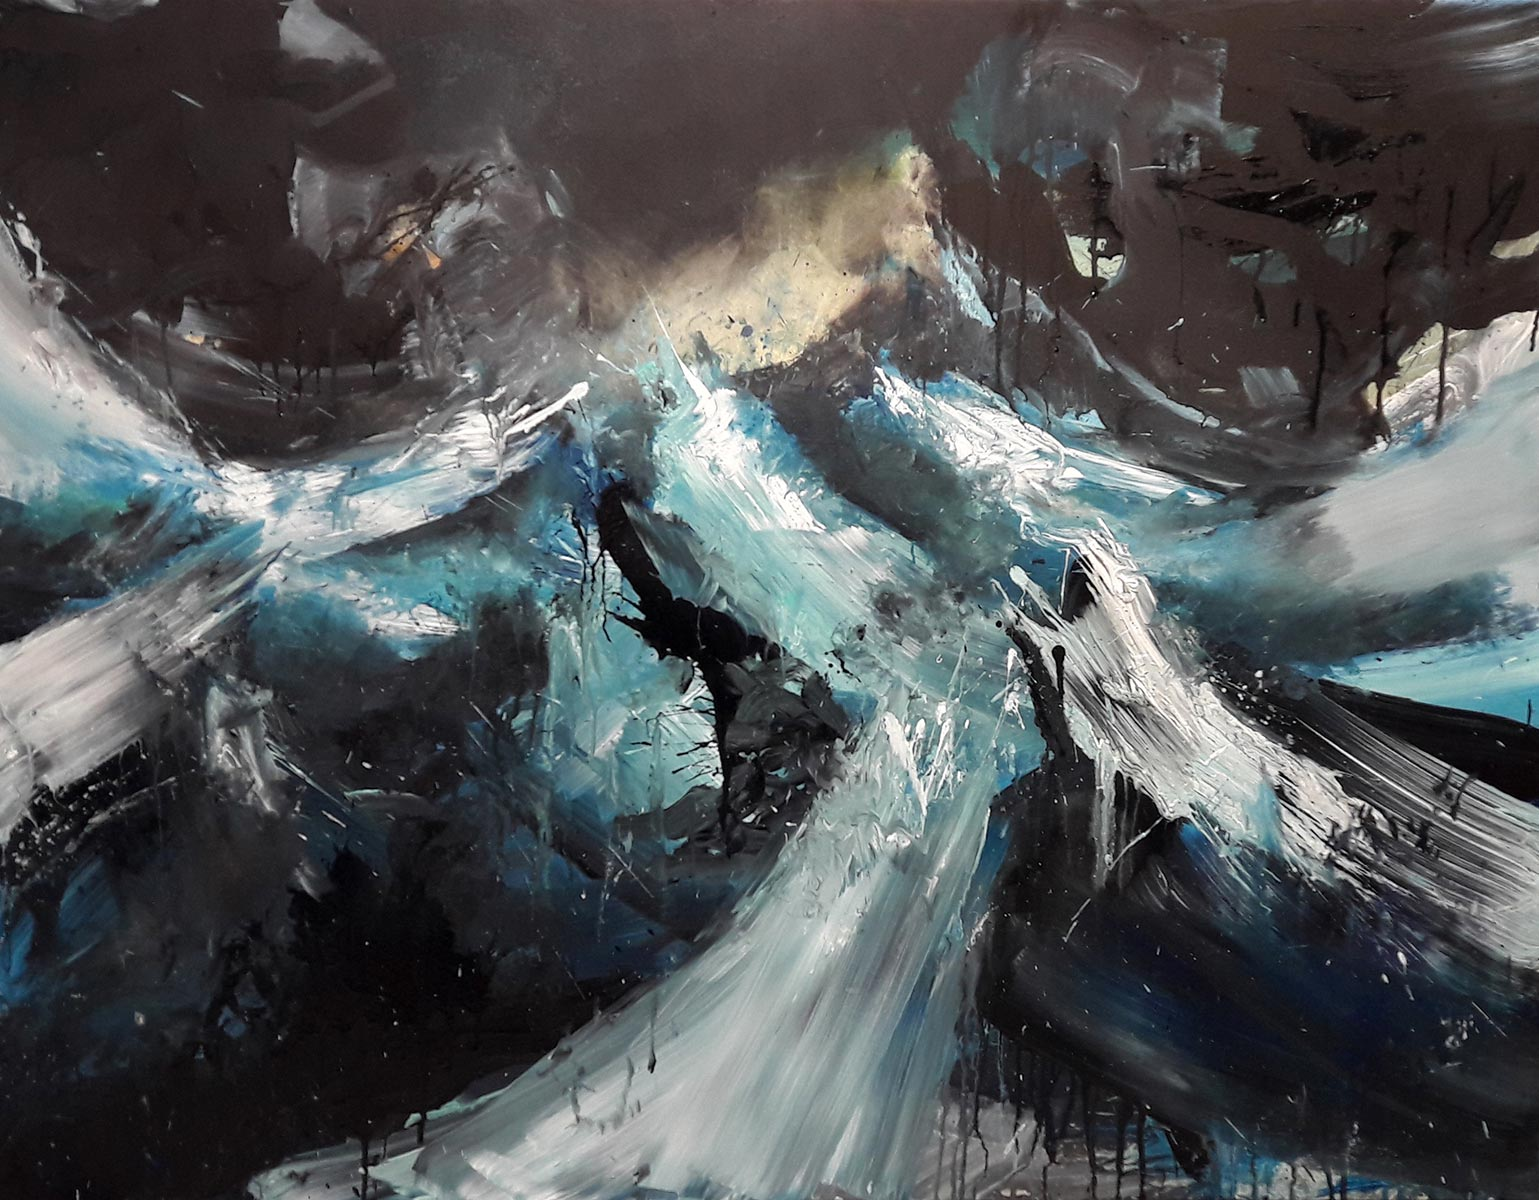 Storm. 2018, acrylic on canvas, 89 x 116 cm